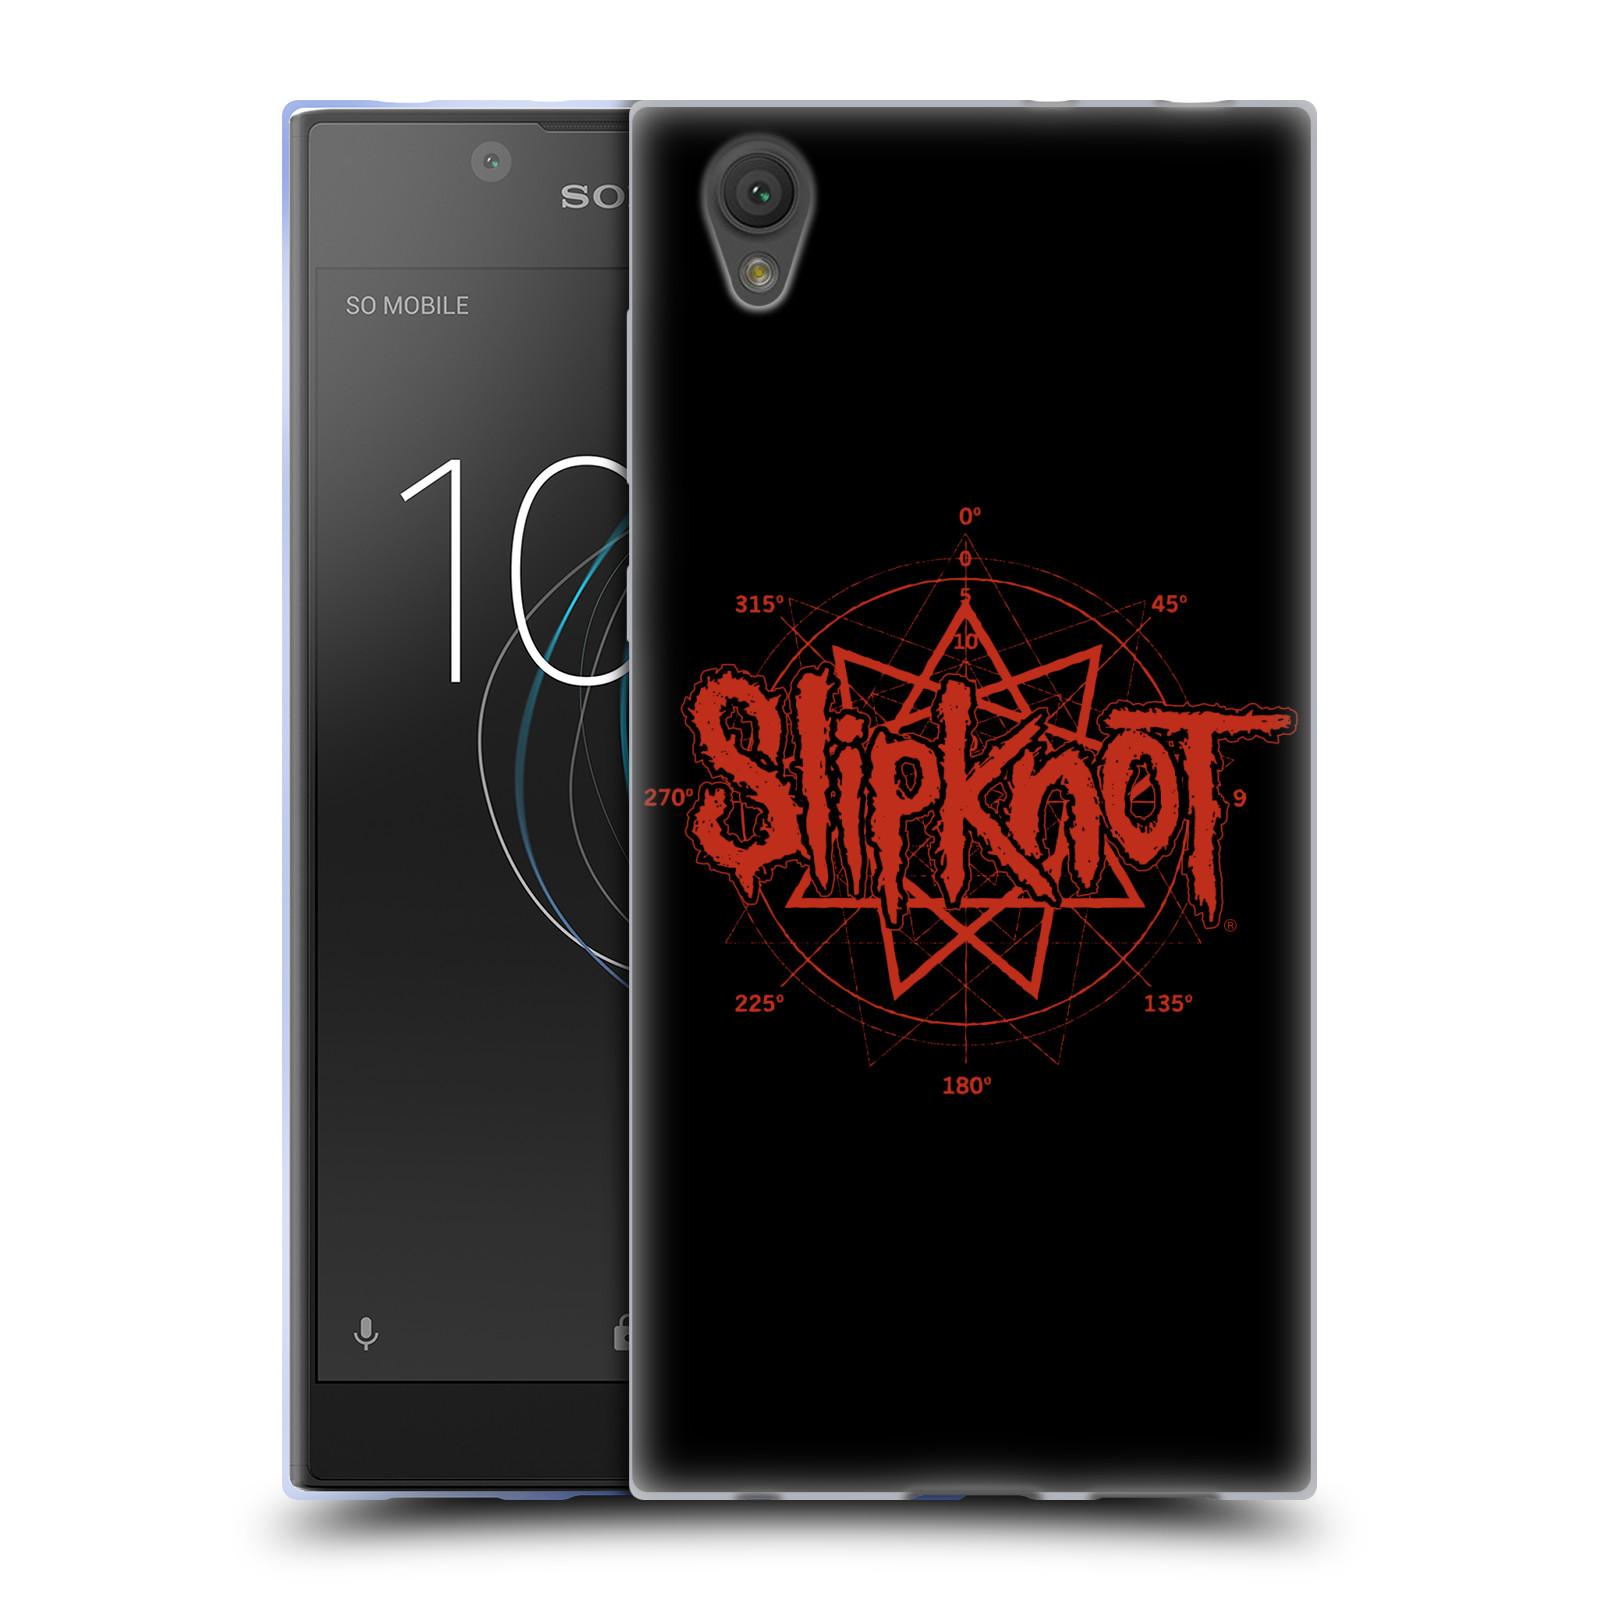 HEAD CASE silikonový obal na mobil Sony Xperia L1 hudební skupina Slipknot logo